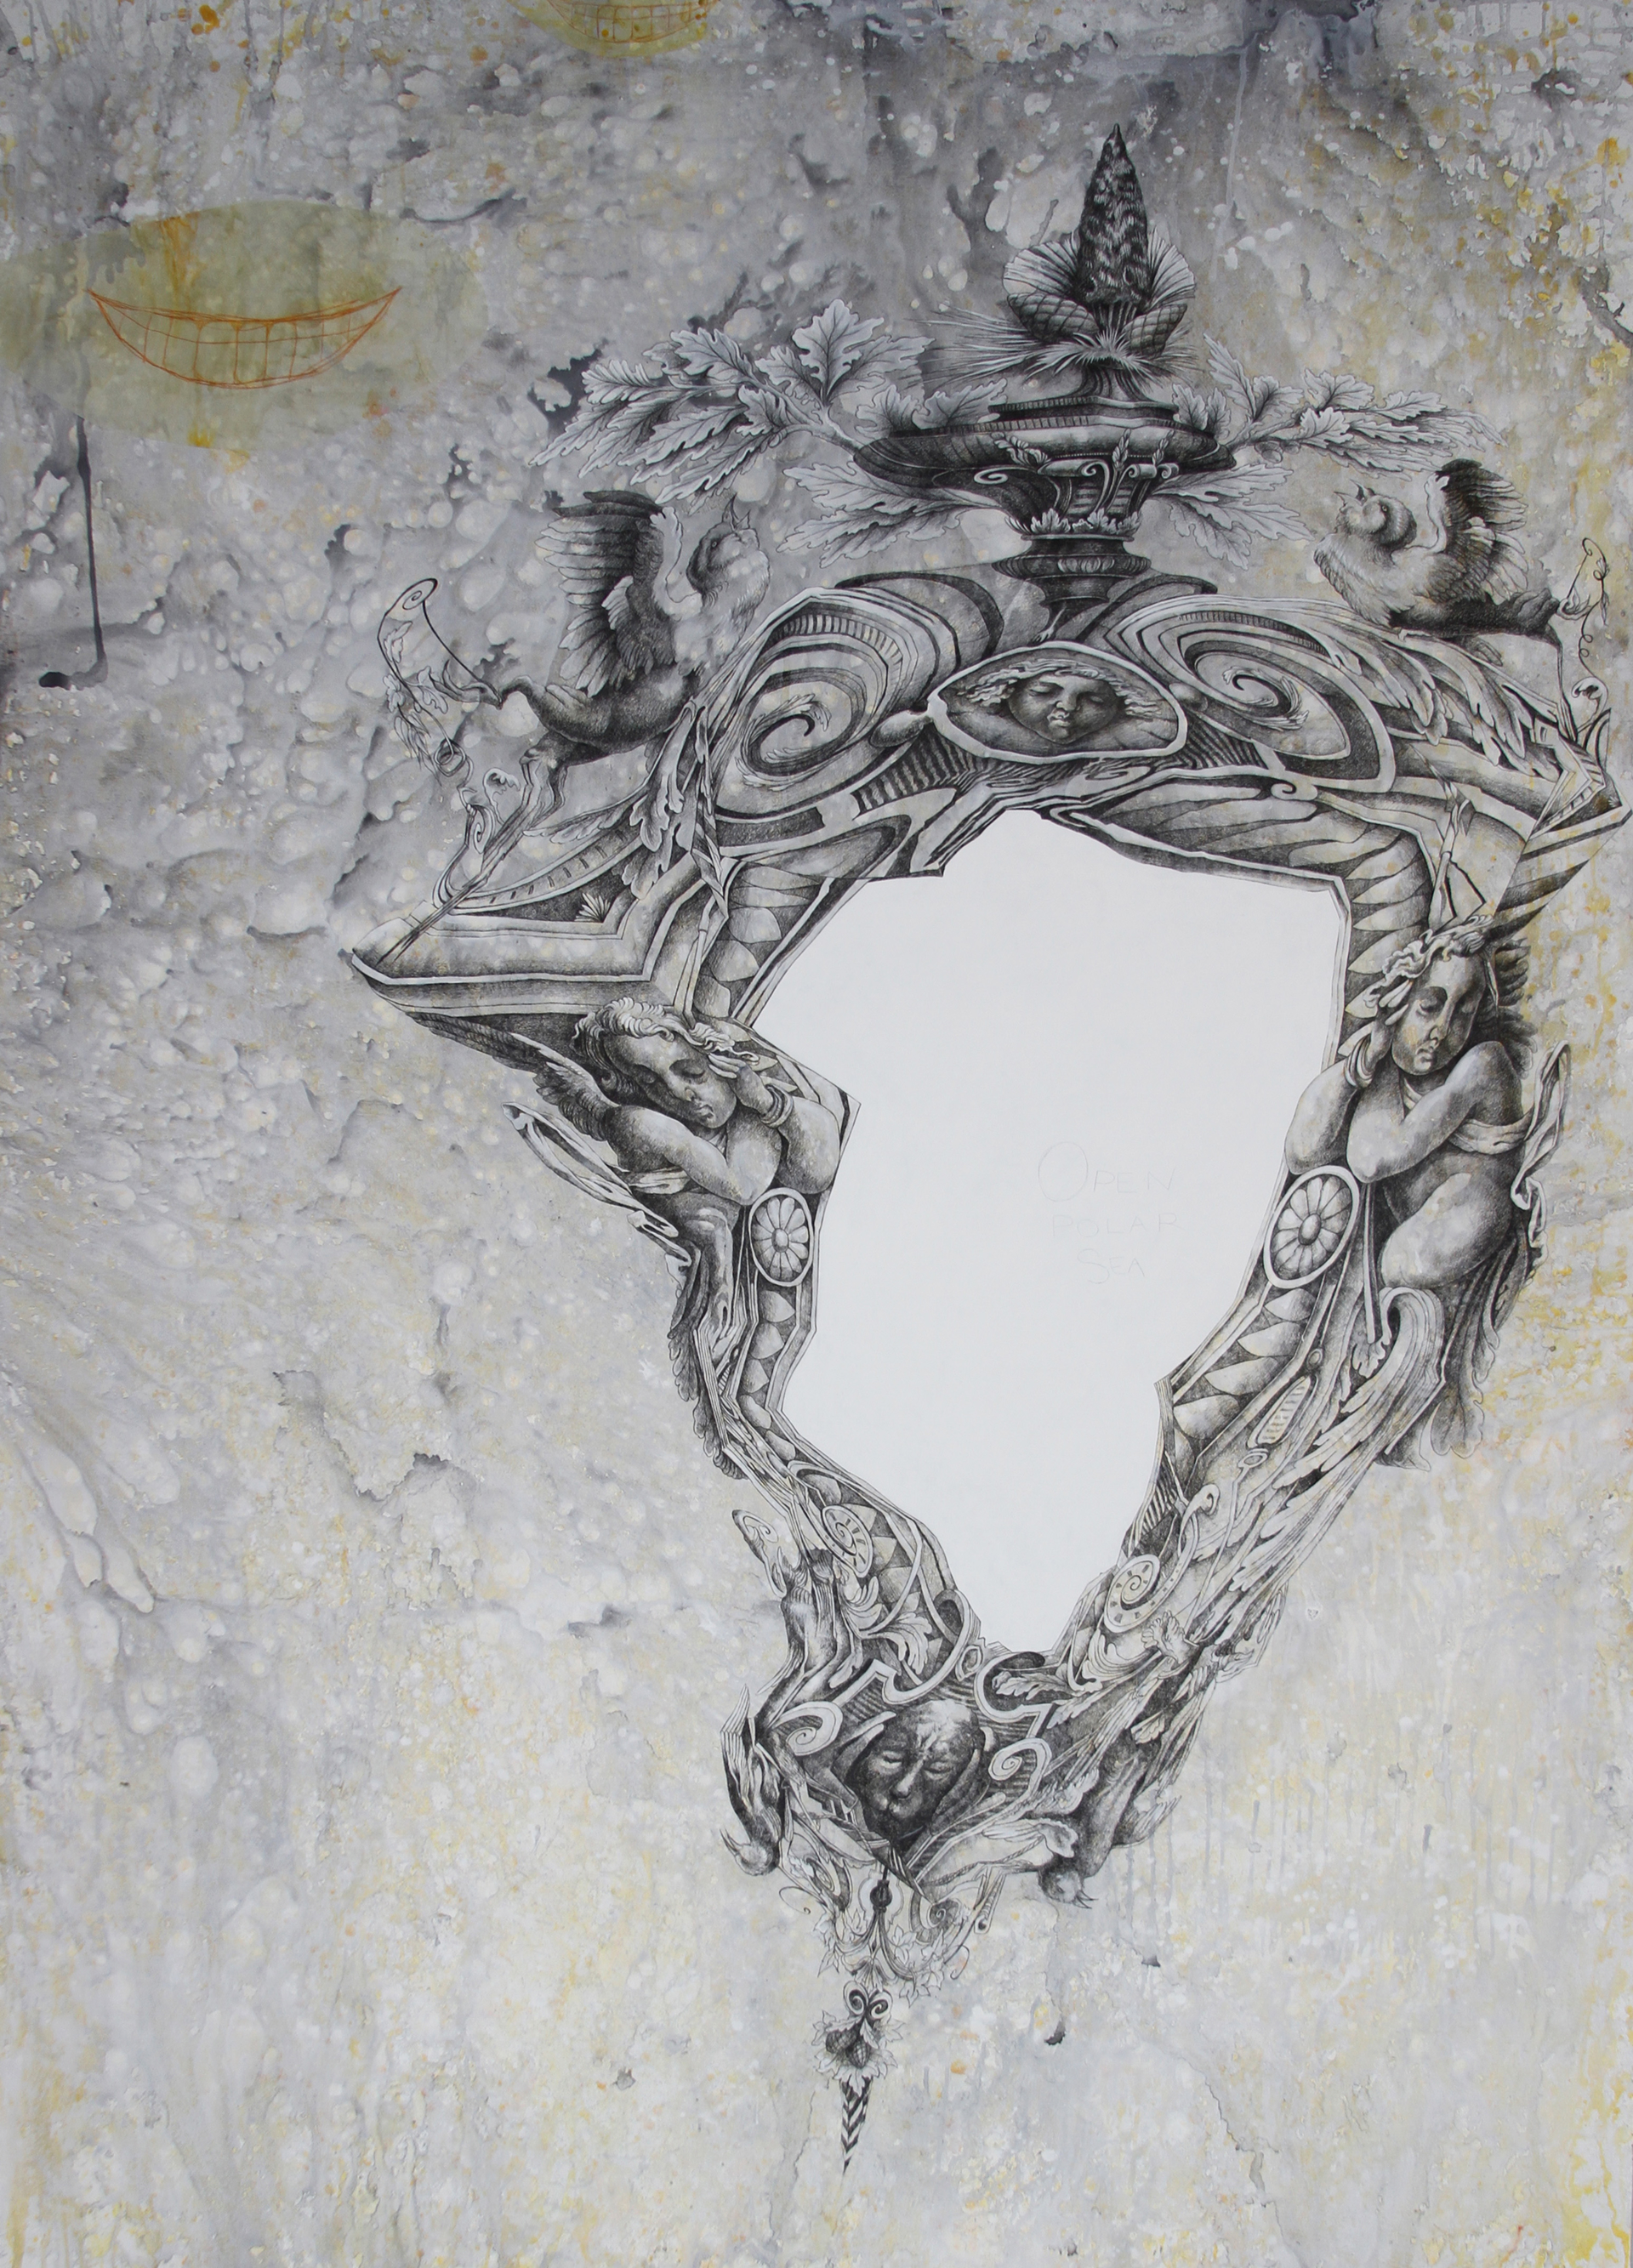 Blind Spots/Cruel Poetics: The Open Polar Sea by Patricia Bellan-Gillen